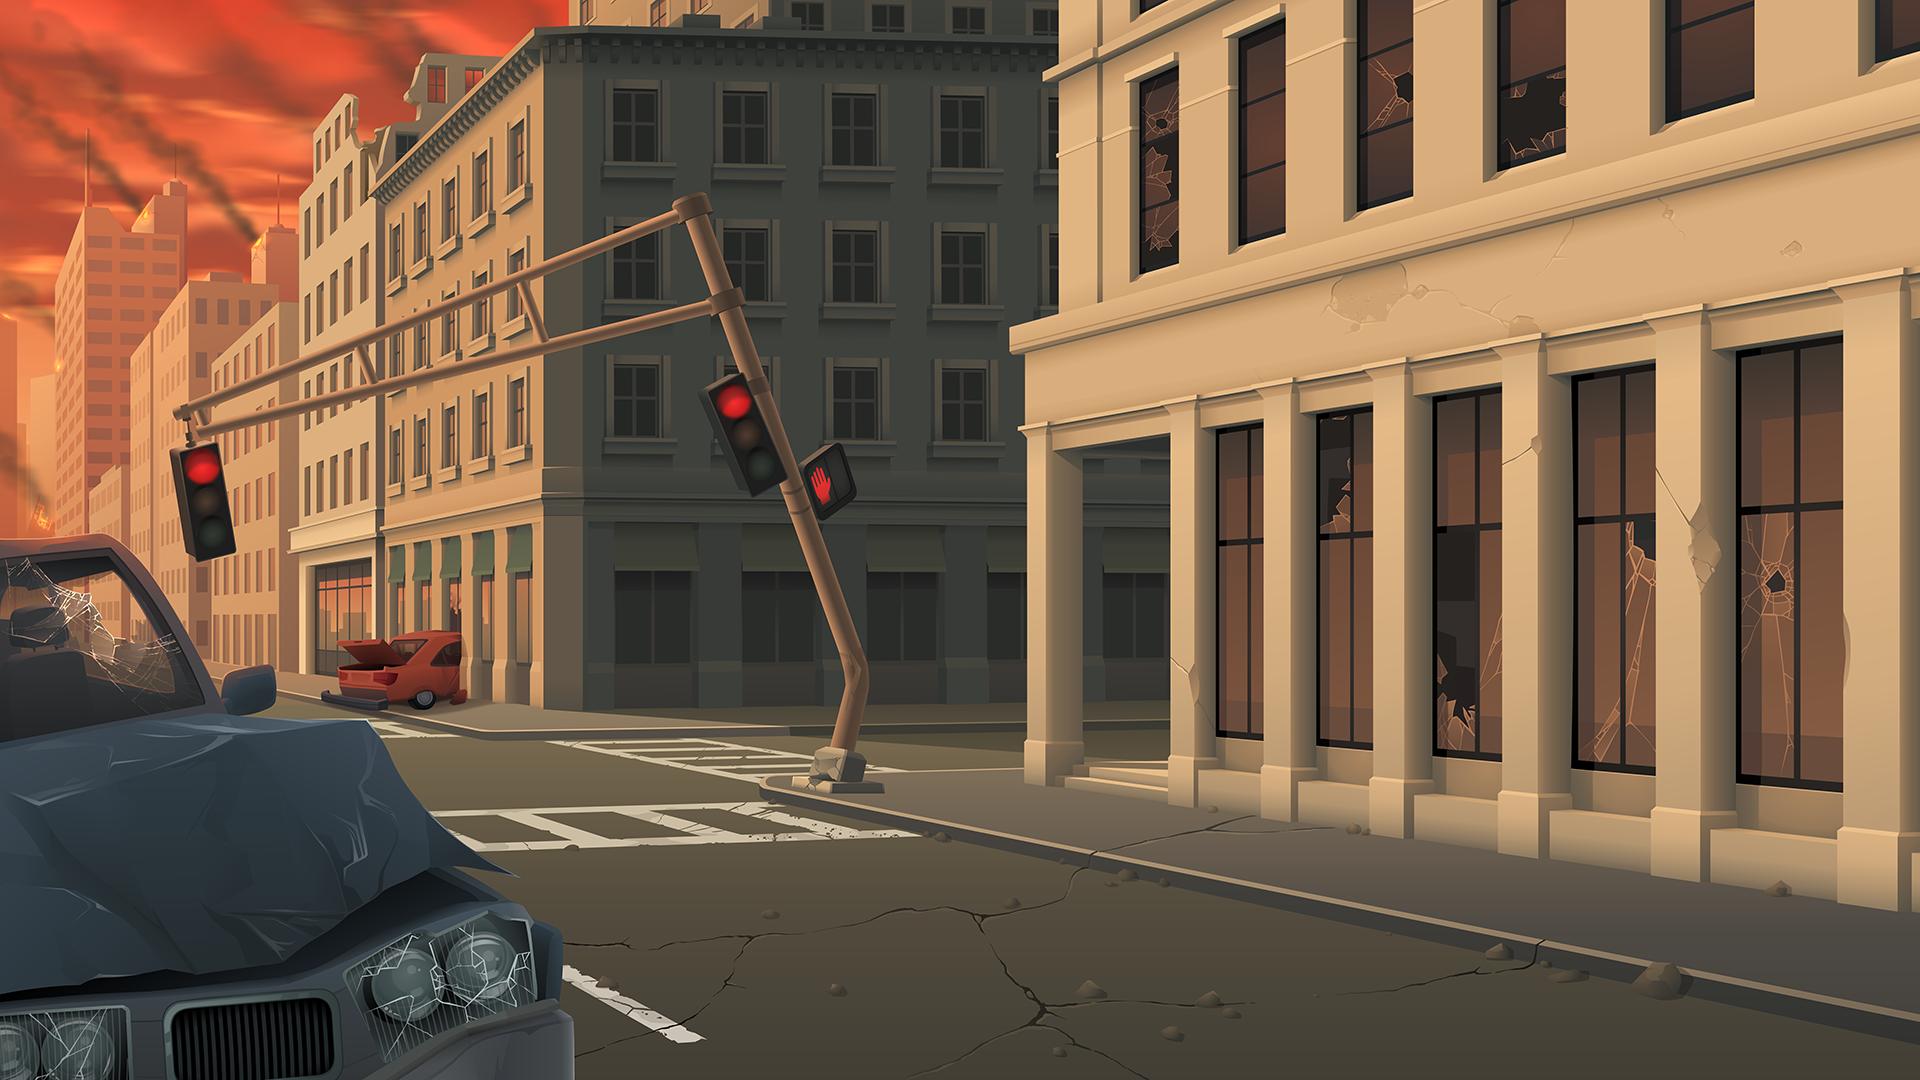 City Street Under Attack - Background Art by zeedox on Newgrounds